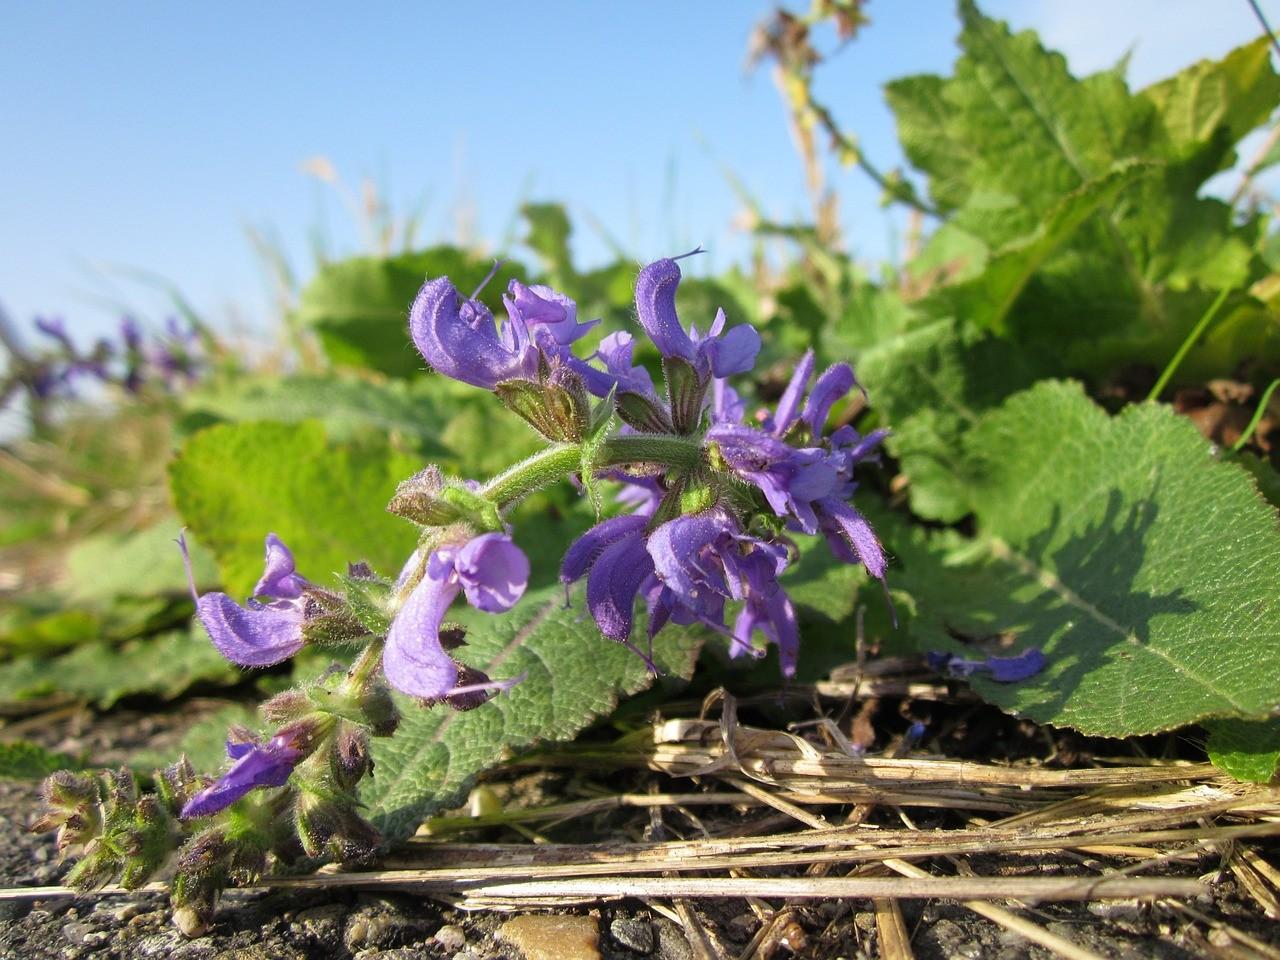 Clary Sage flowers